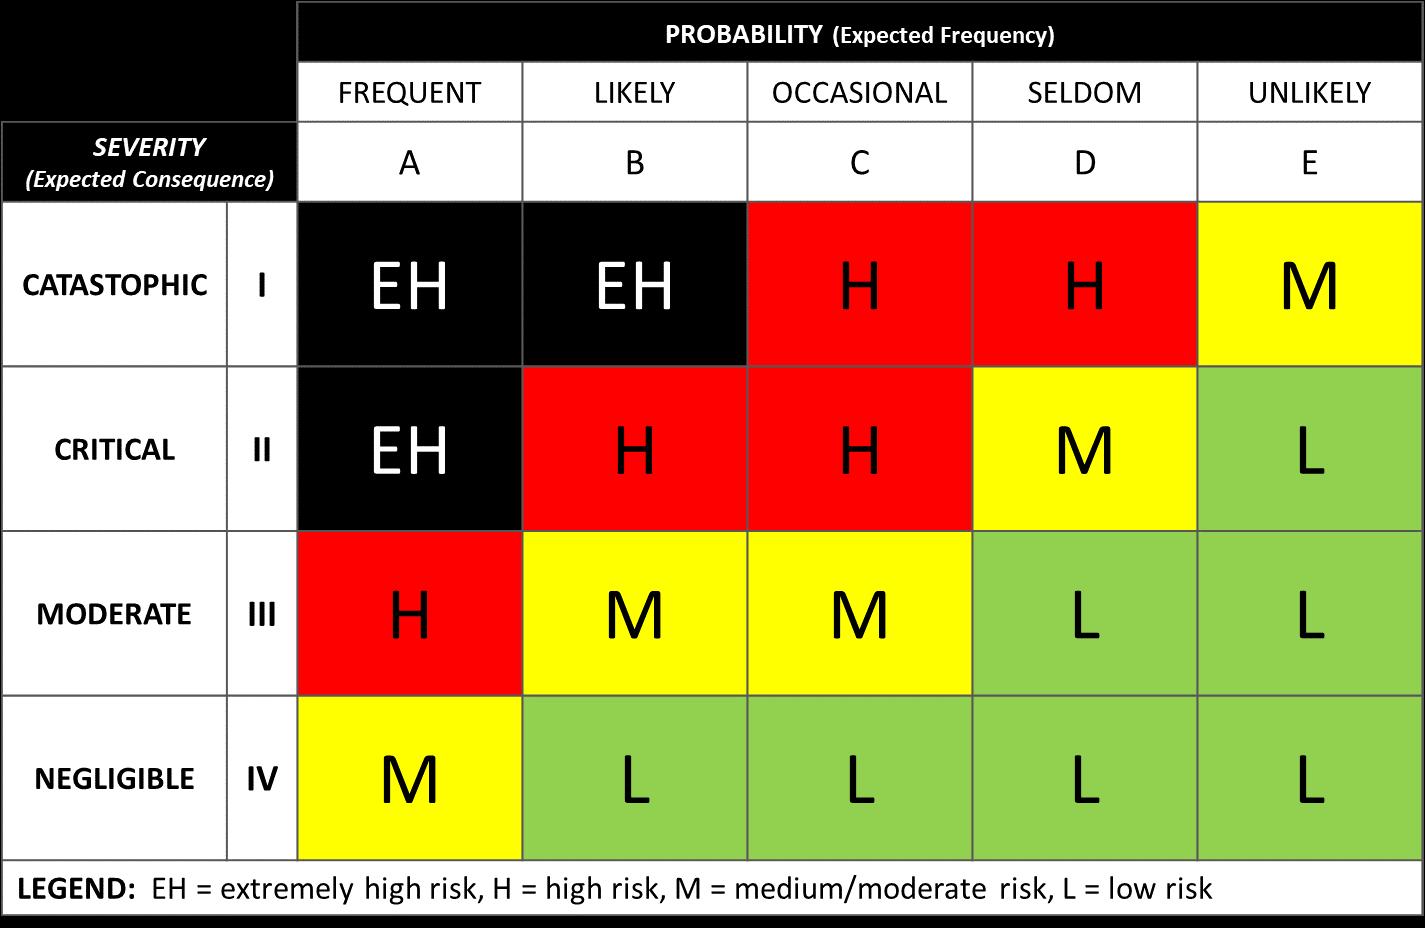 U.S. Army risk management model